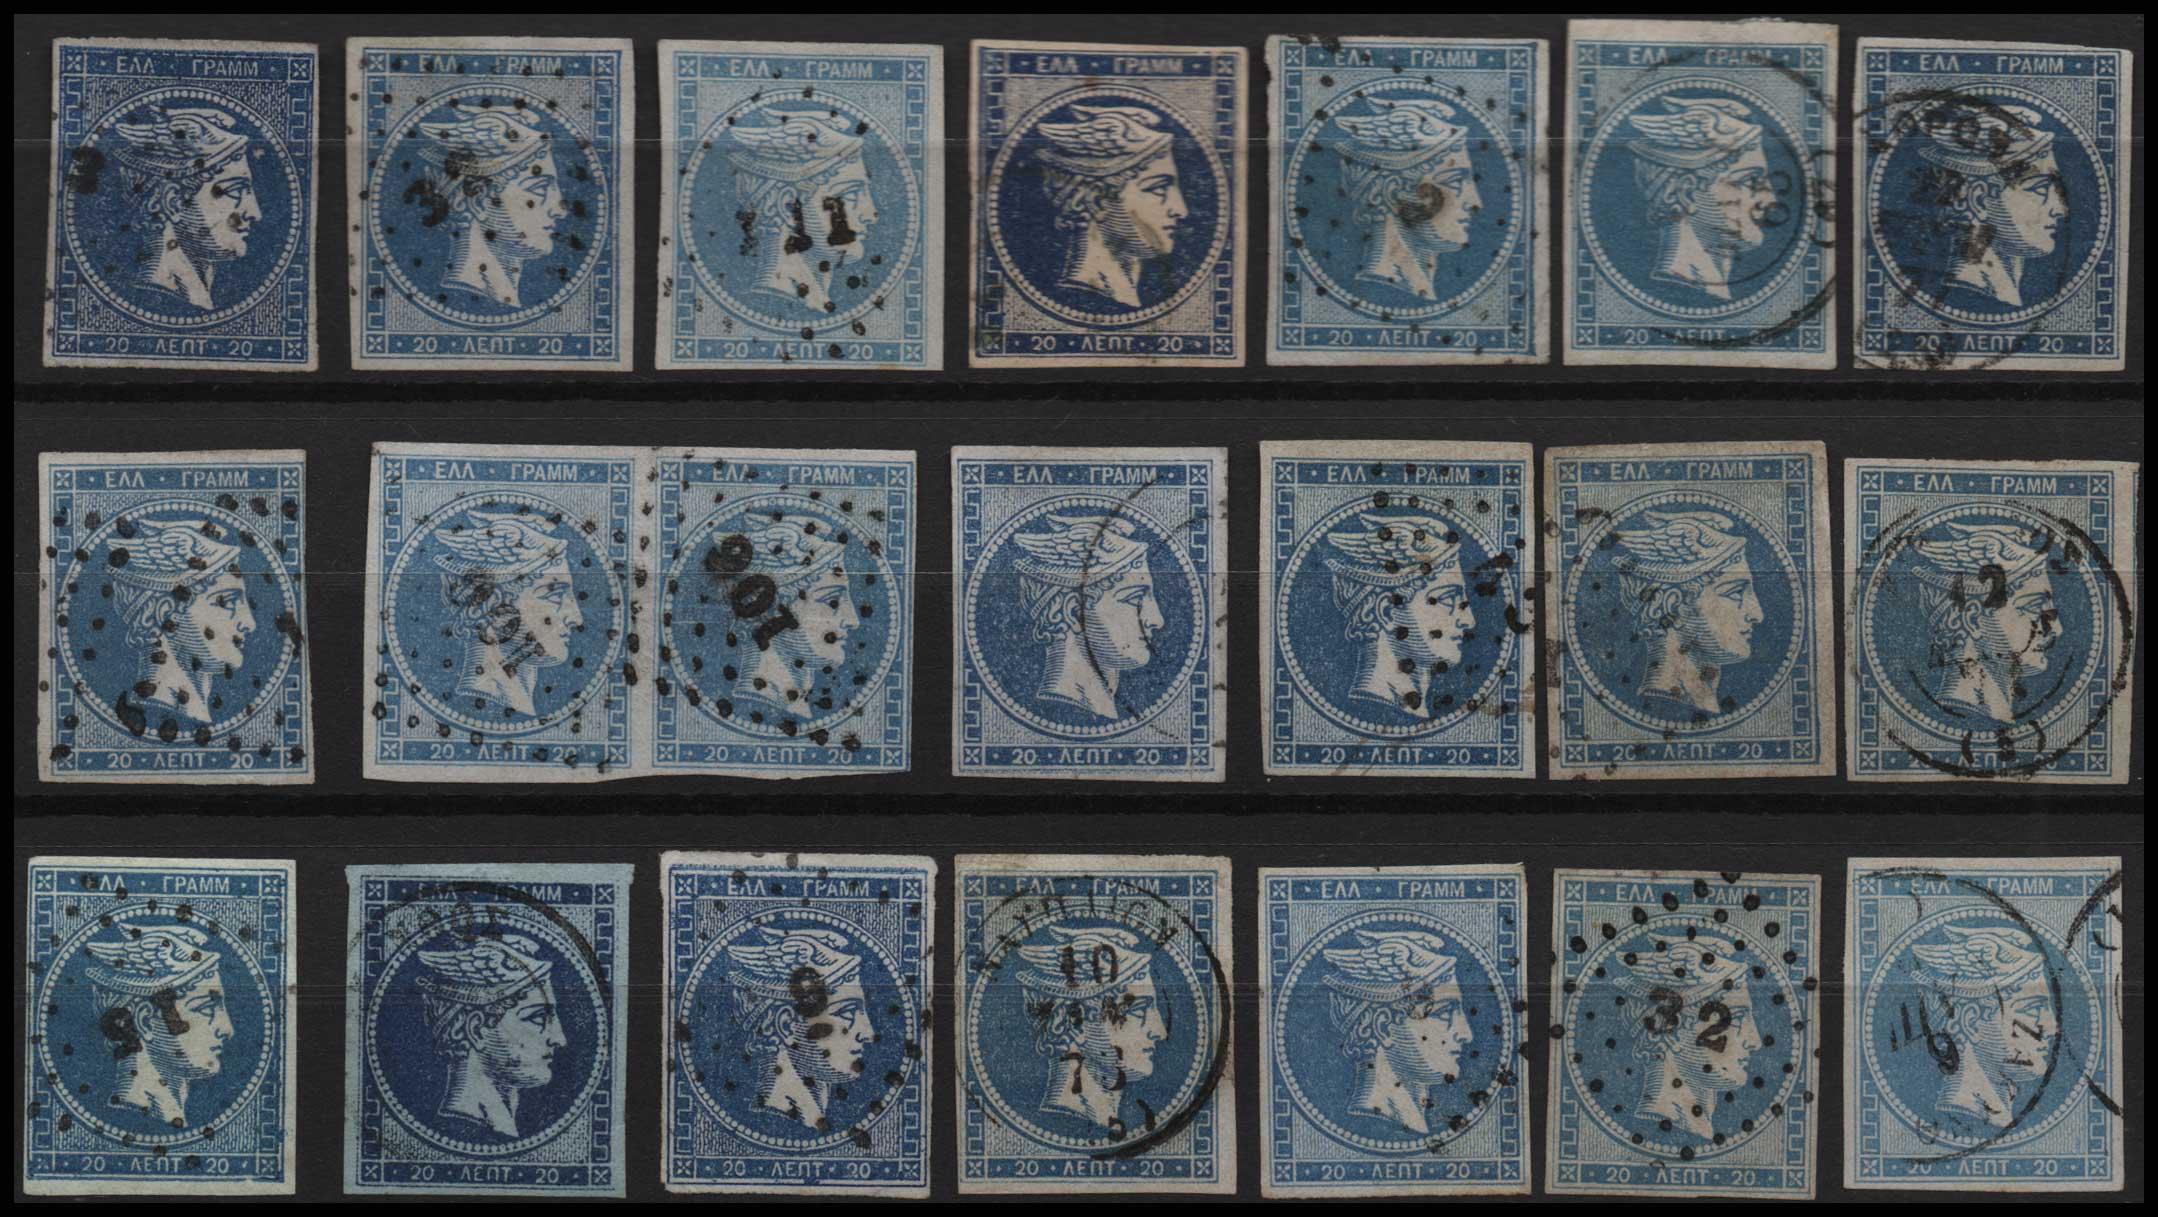 Lot 7 - -  LARGE HERMES HEAD large hermes head -  Athens Auctions Public Auction 85 General Stamp Sale